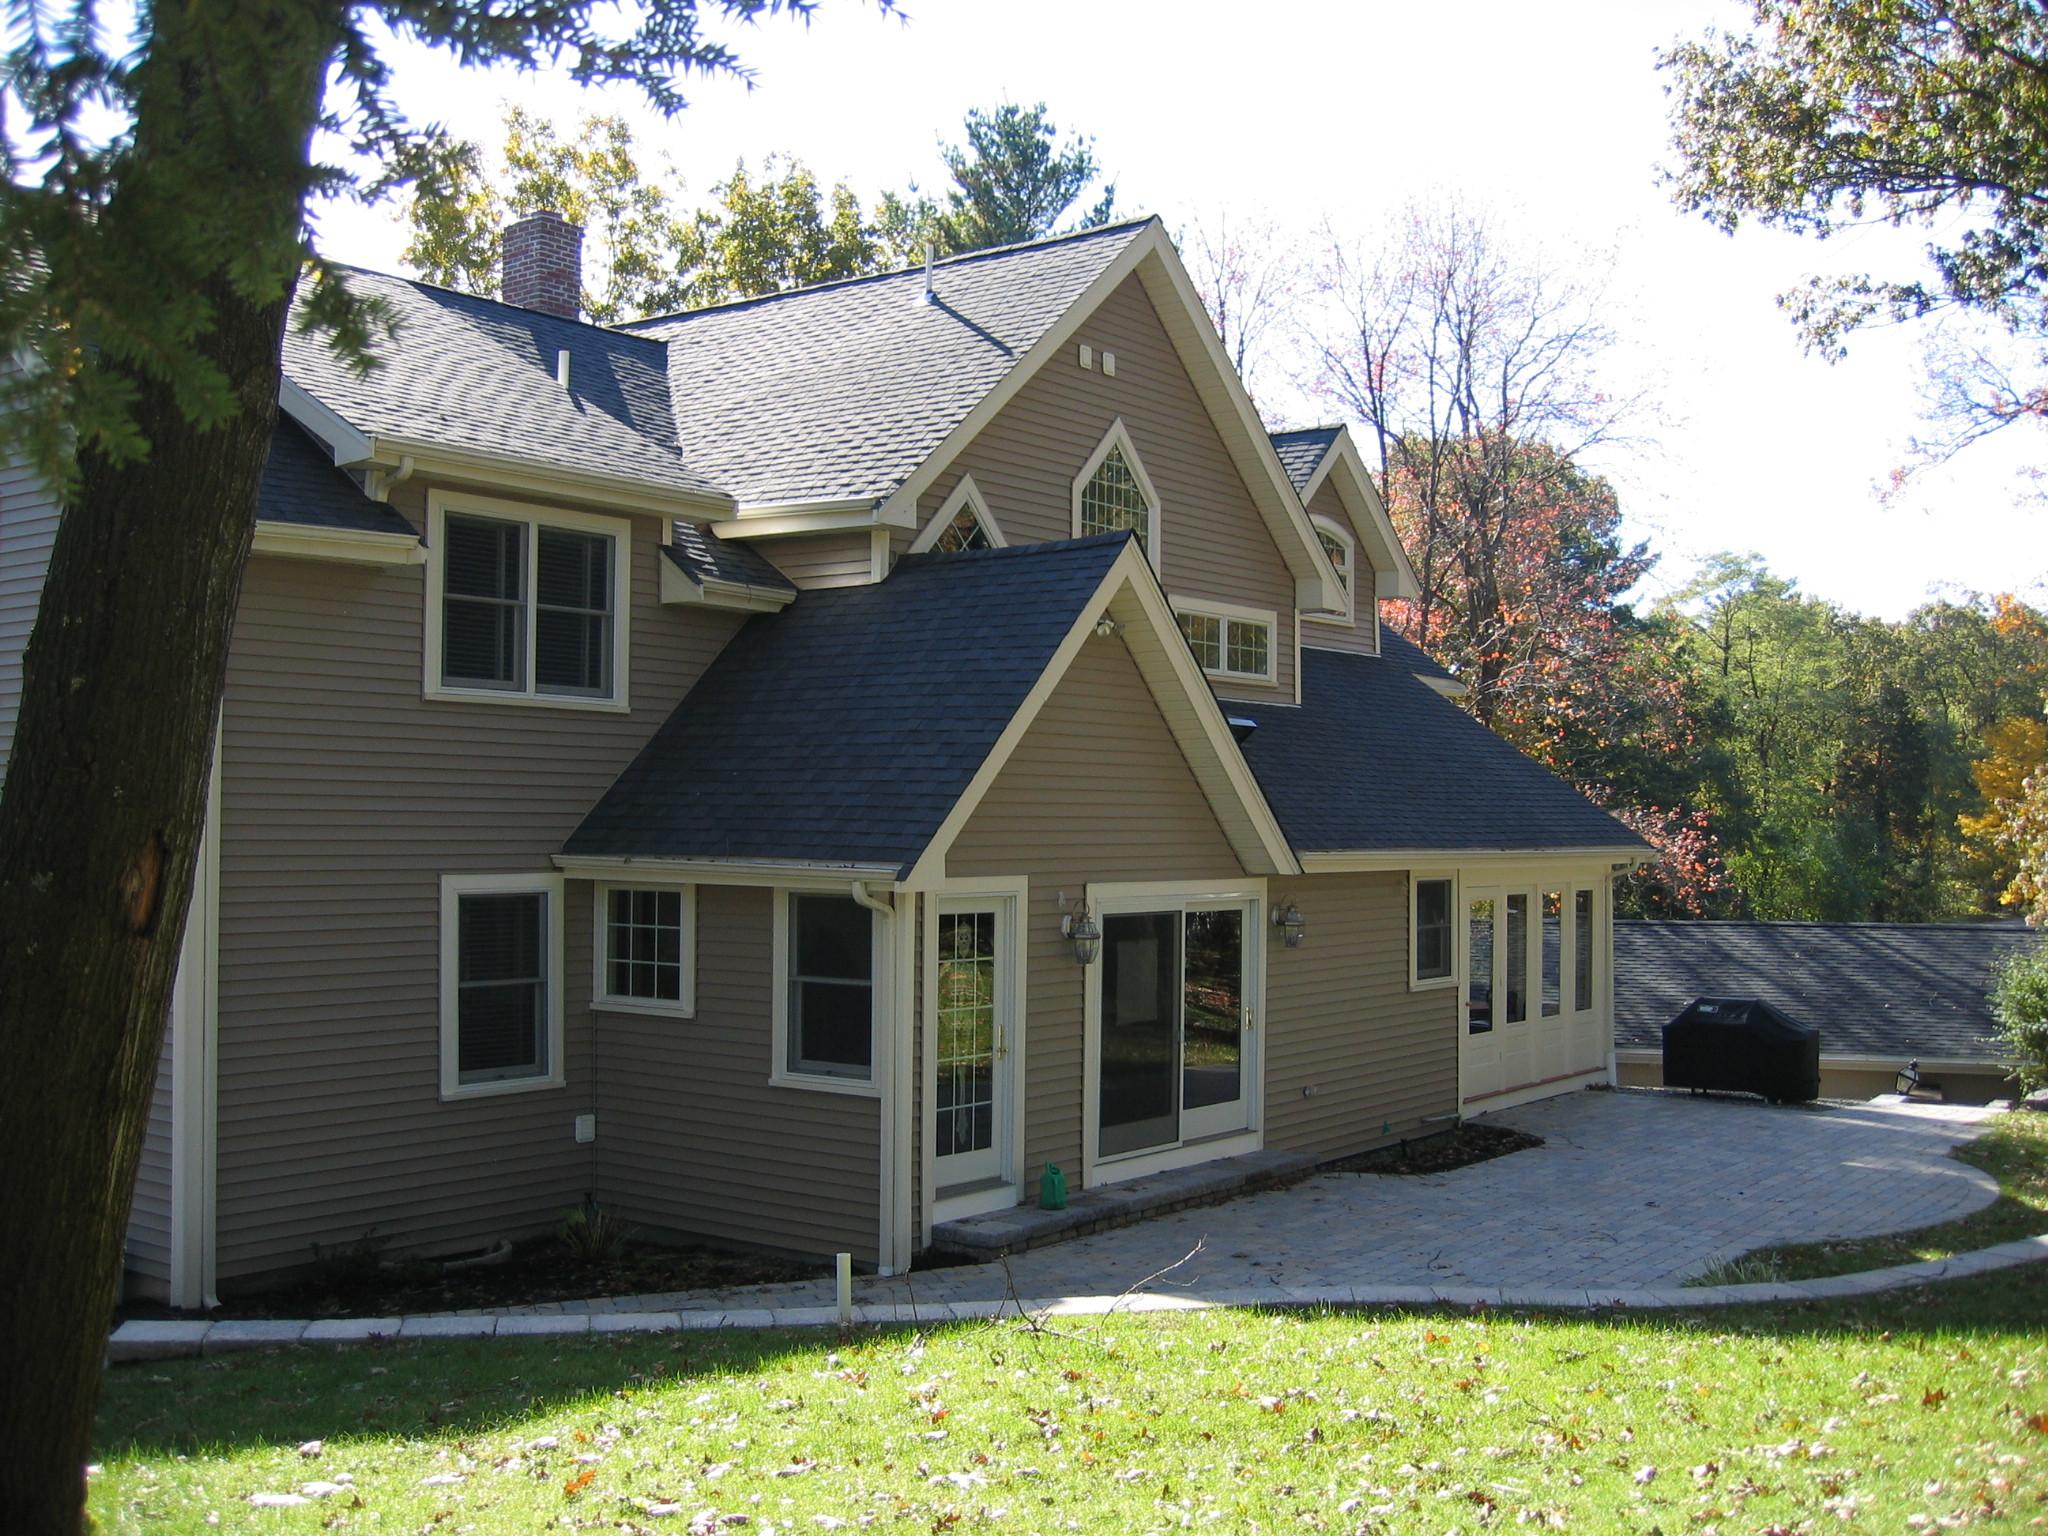 Graceffa Residence